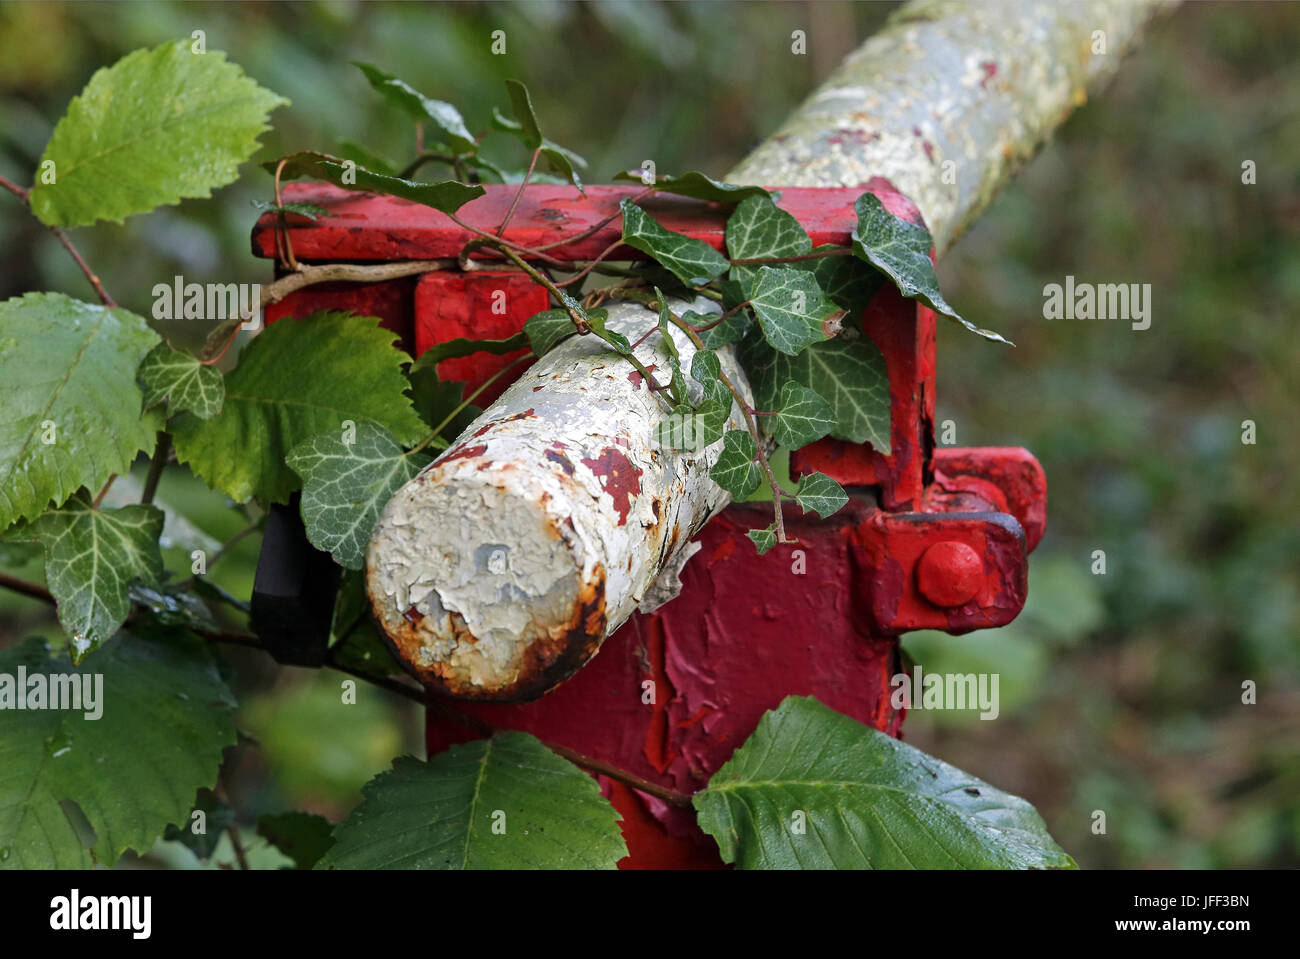 Alte Schranke Stockfotos & Alte Schranke Bilder - Alamy